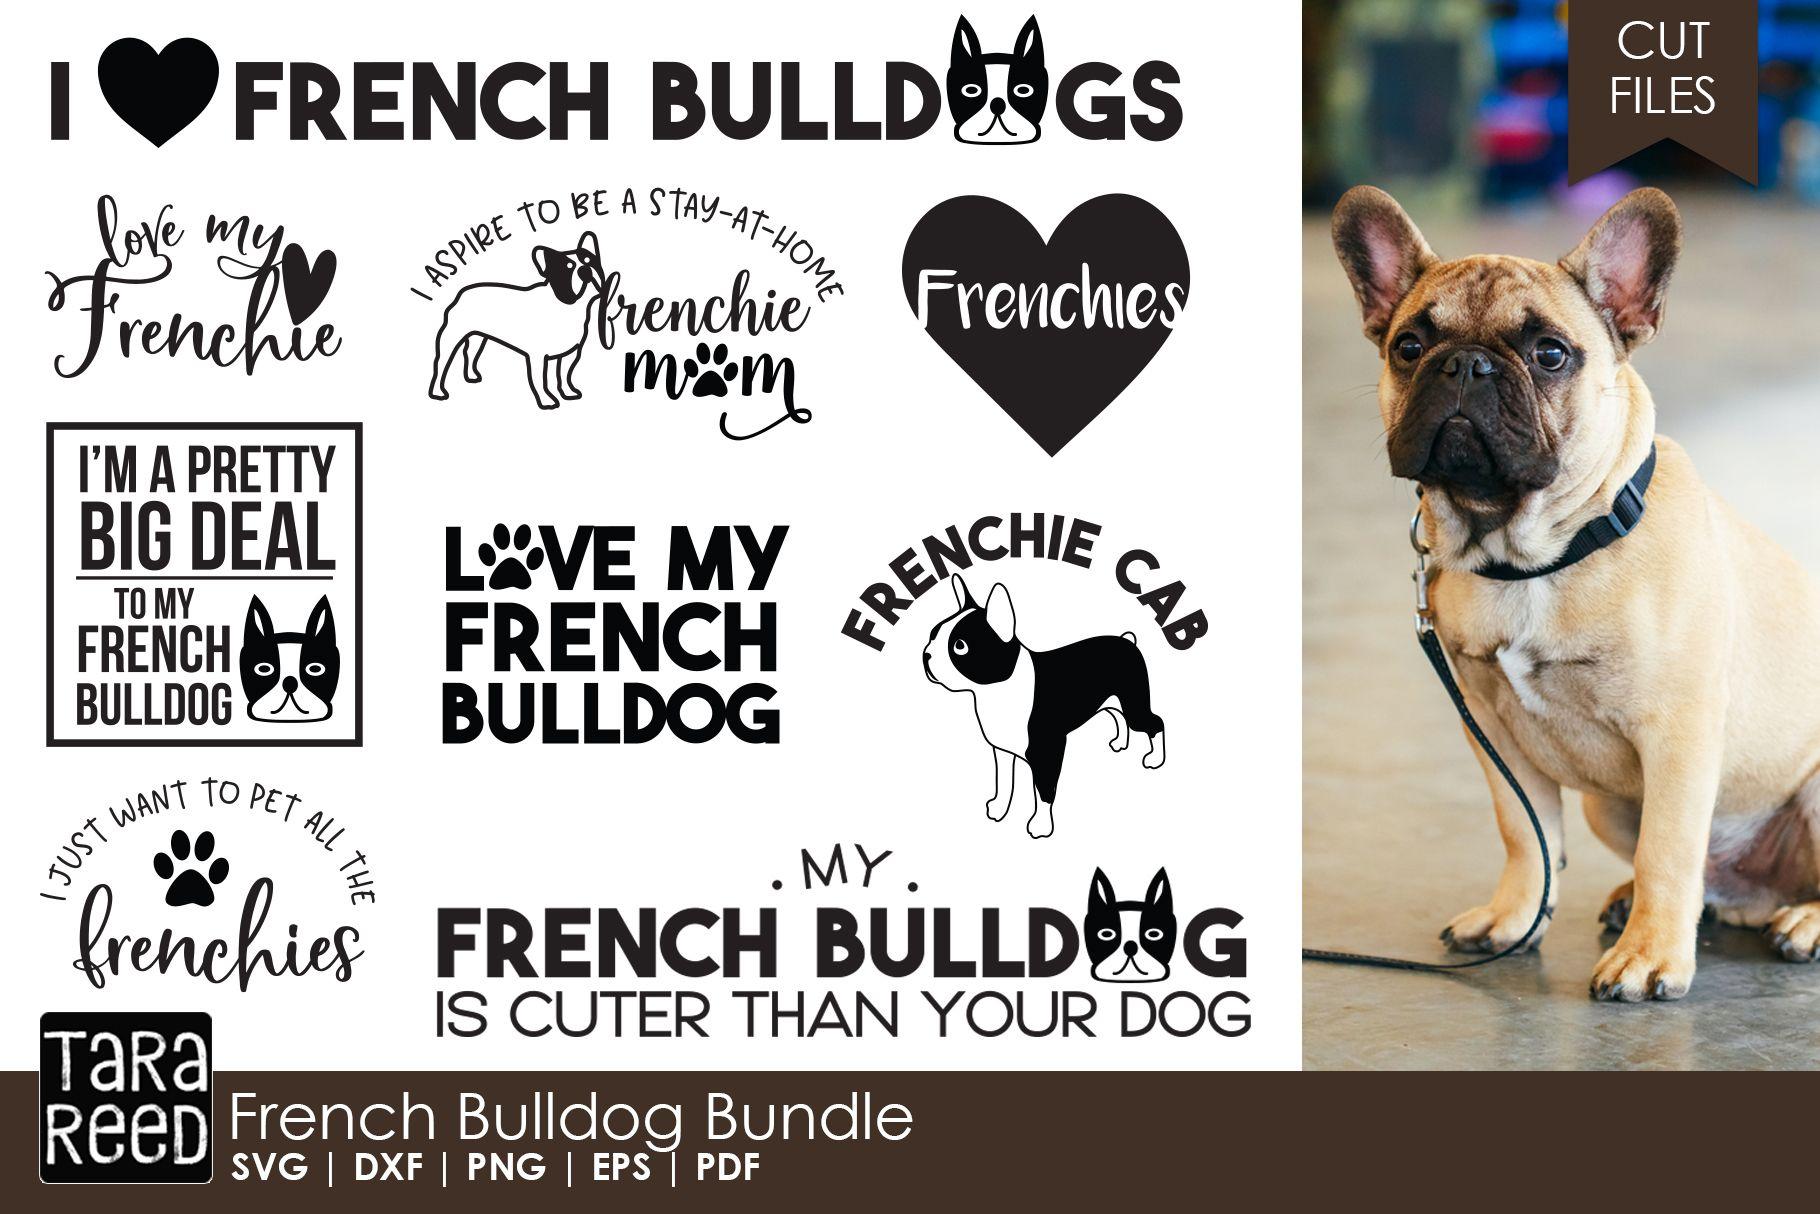 French Bulldog Bundle French Bulldog French I Am Game